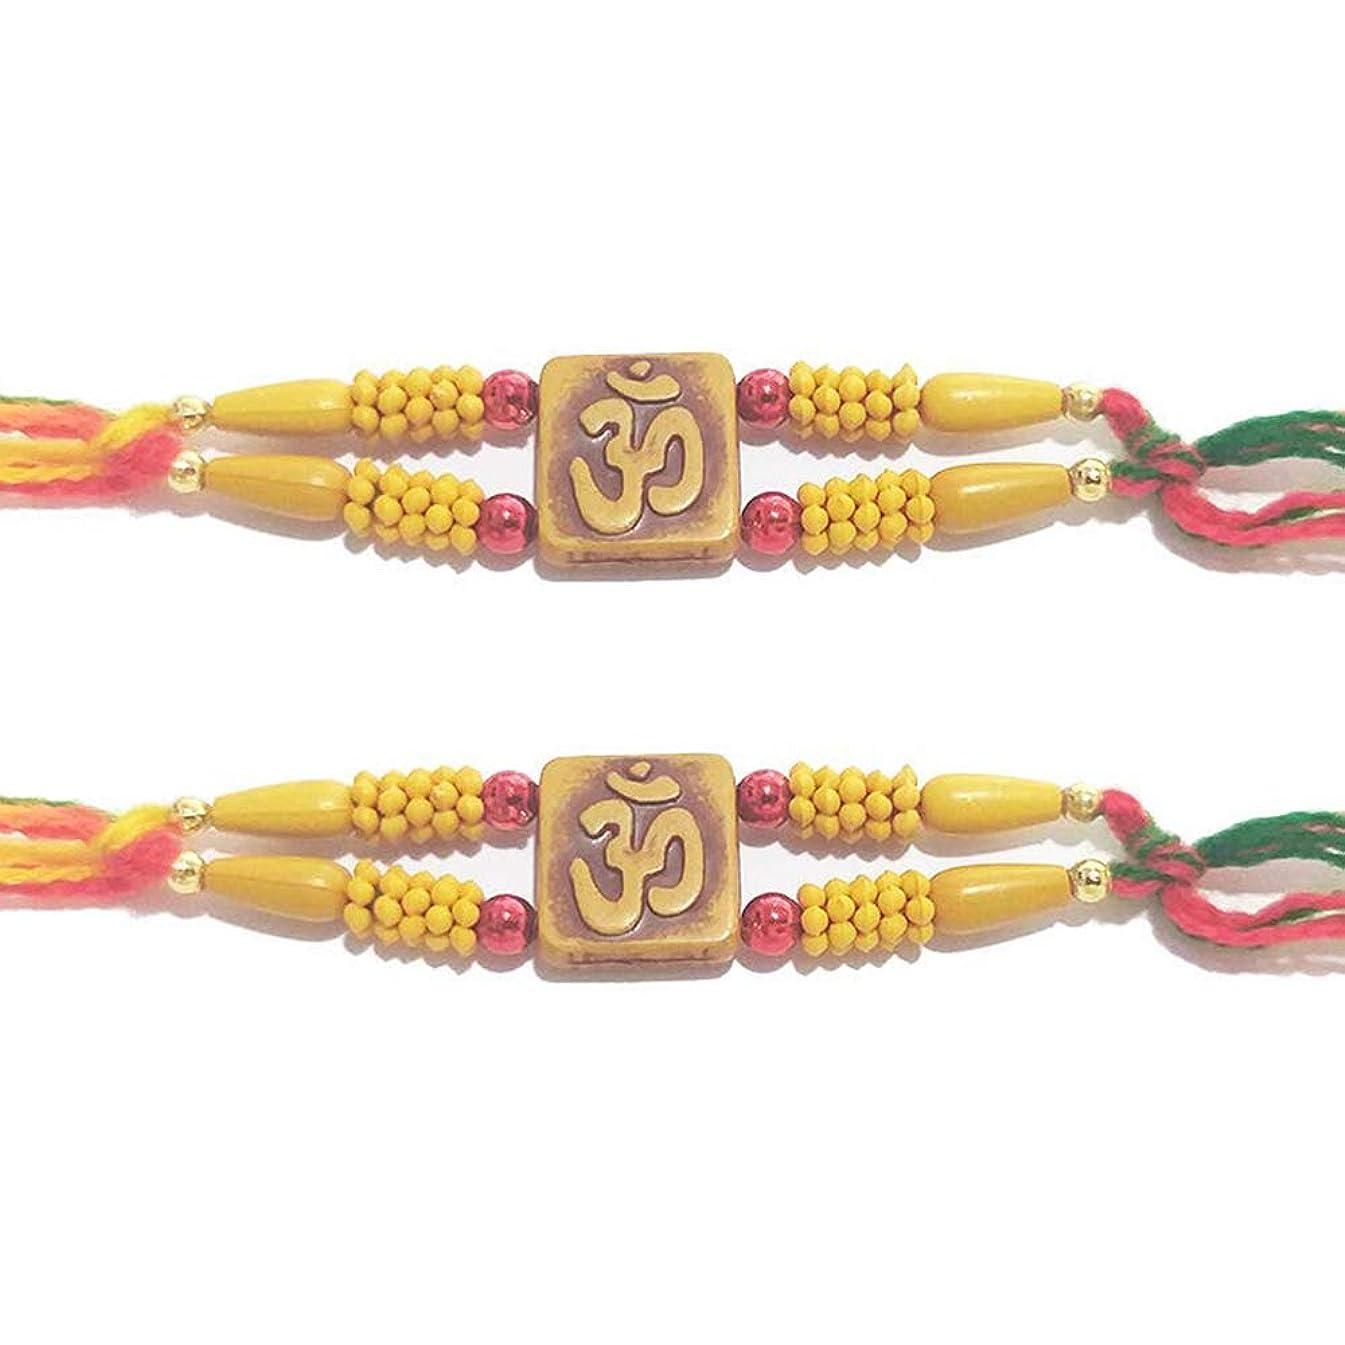 Bignay Set of 2 Rakhi Thread, Big OM Design, Rakhi for Brother, Rakhi Bracelet, Rakhabandhan Rakhi (Assorted Design & Color)